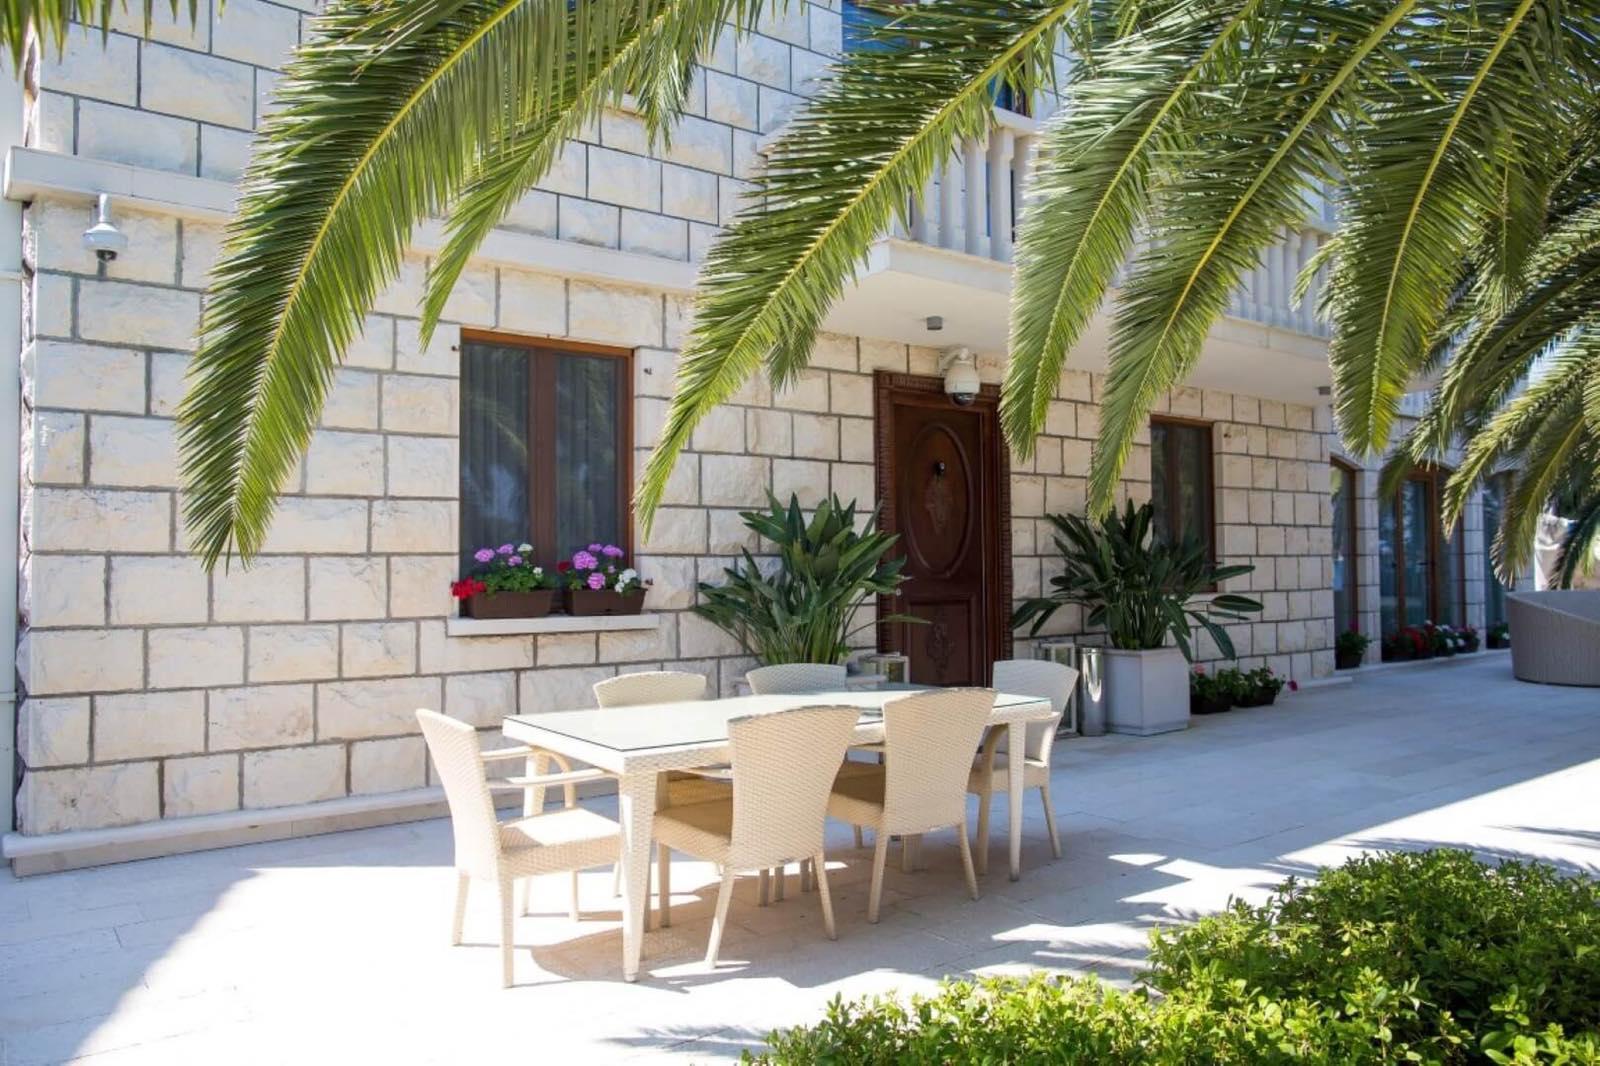 amforaproperty.com/Luksuzna vila na obali mora, Tivat